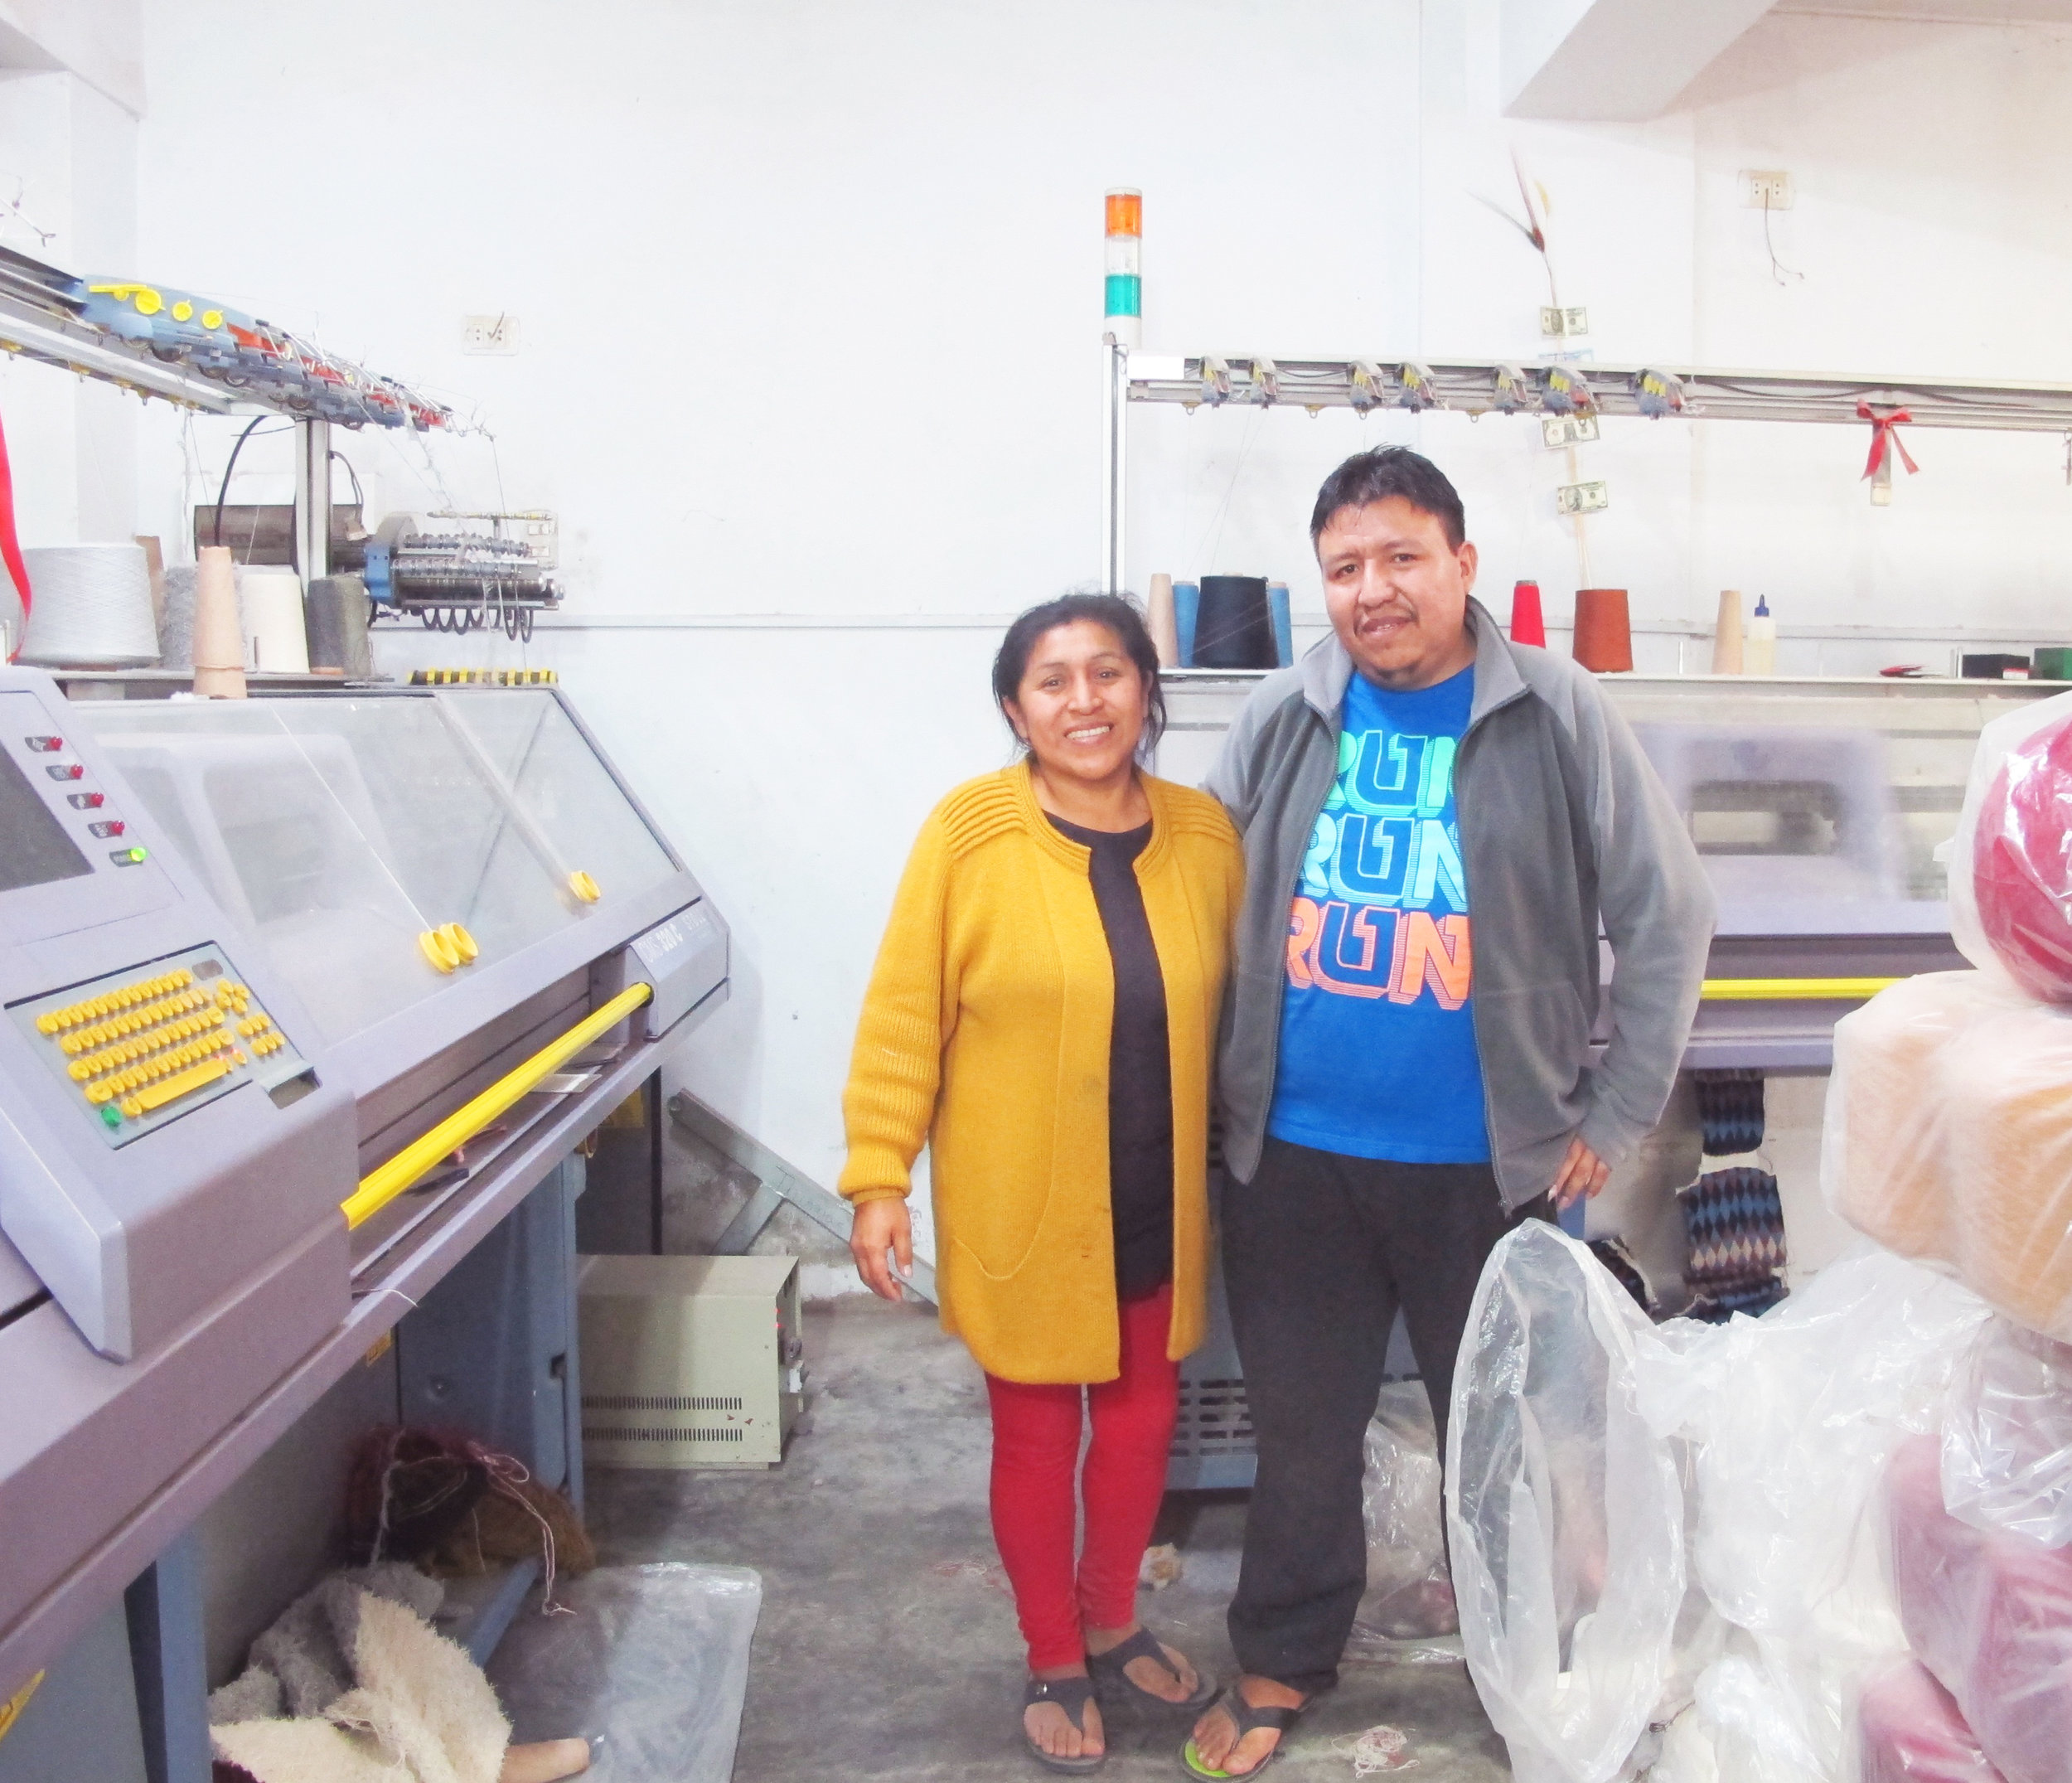 hand-knit-crochet-machine-peru-manufacturing-production